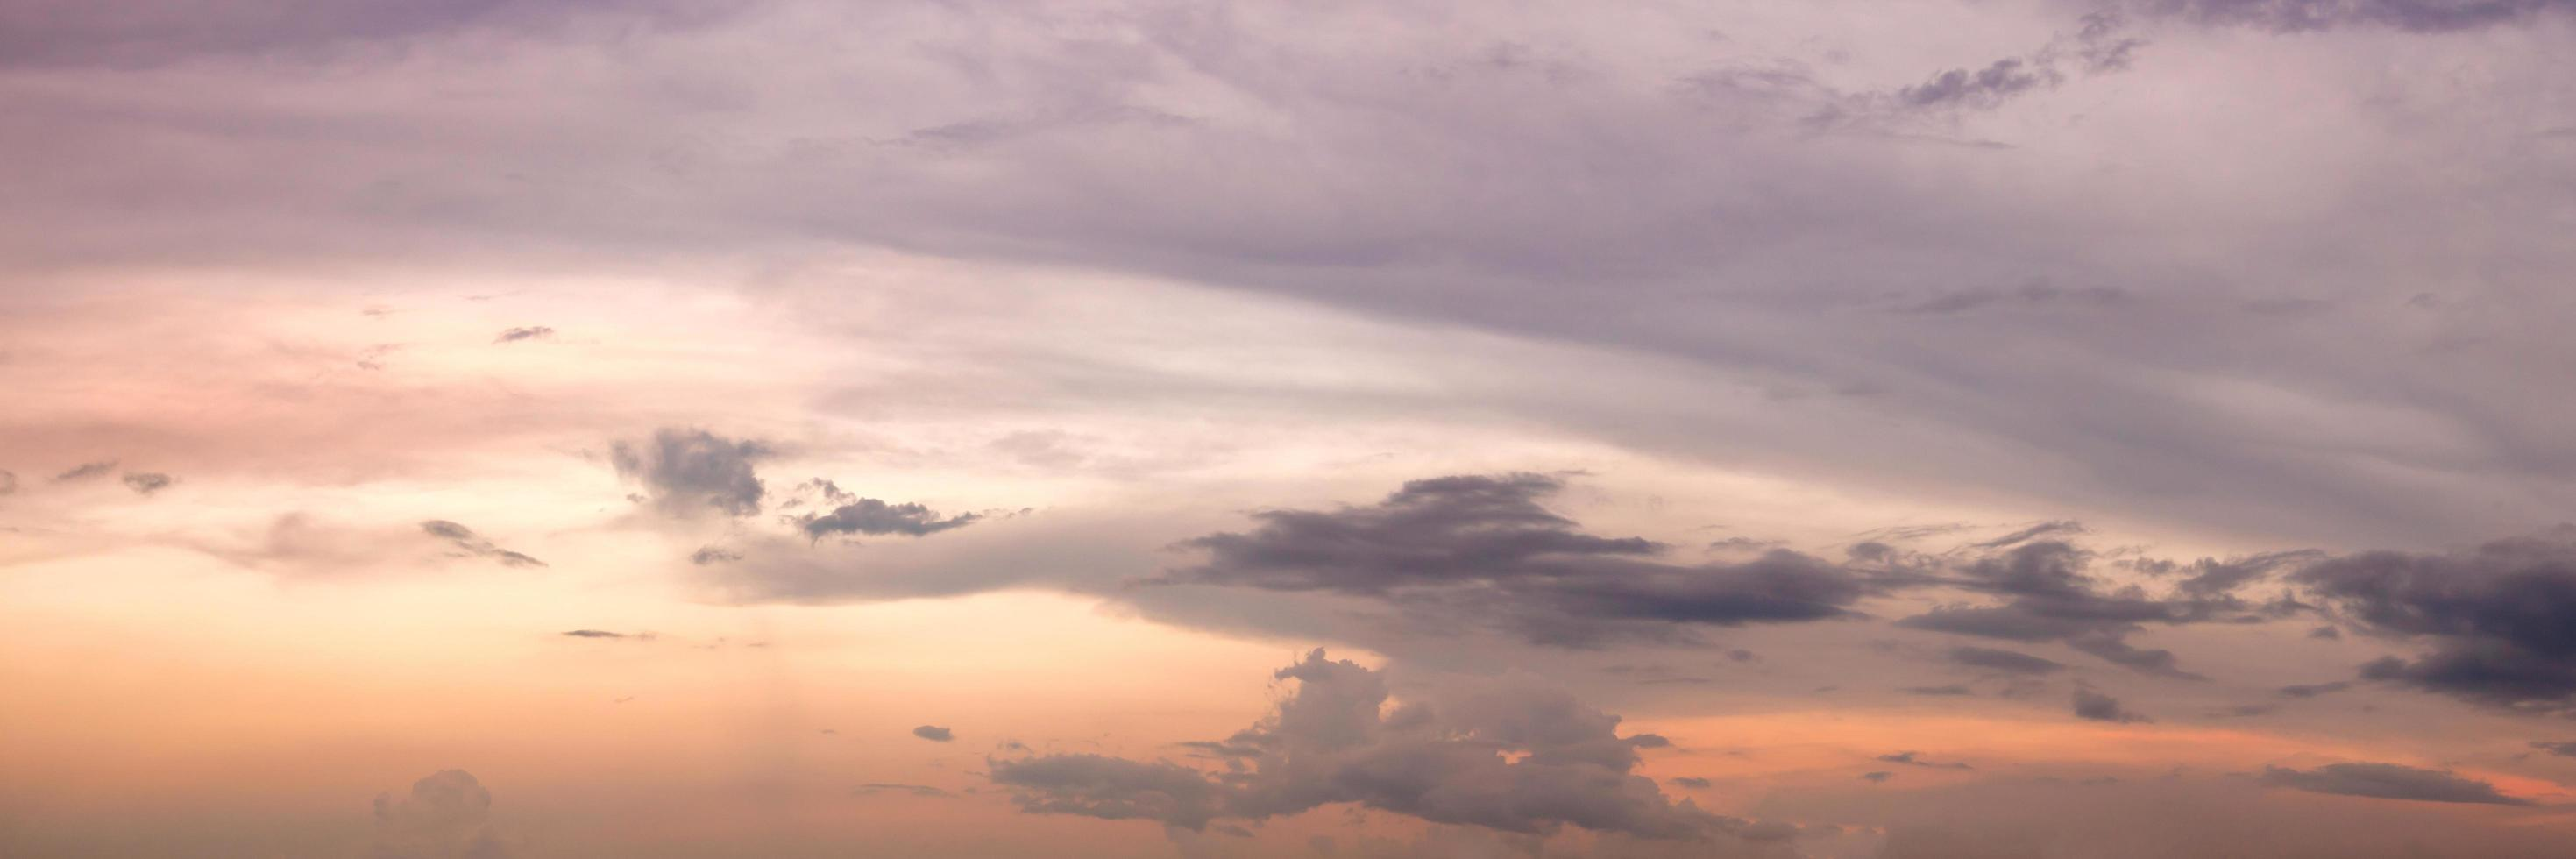 zonsopgang en zonsondergang achtergrond. foto